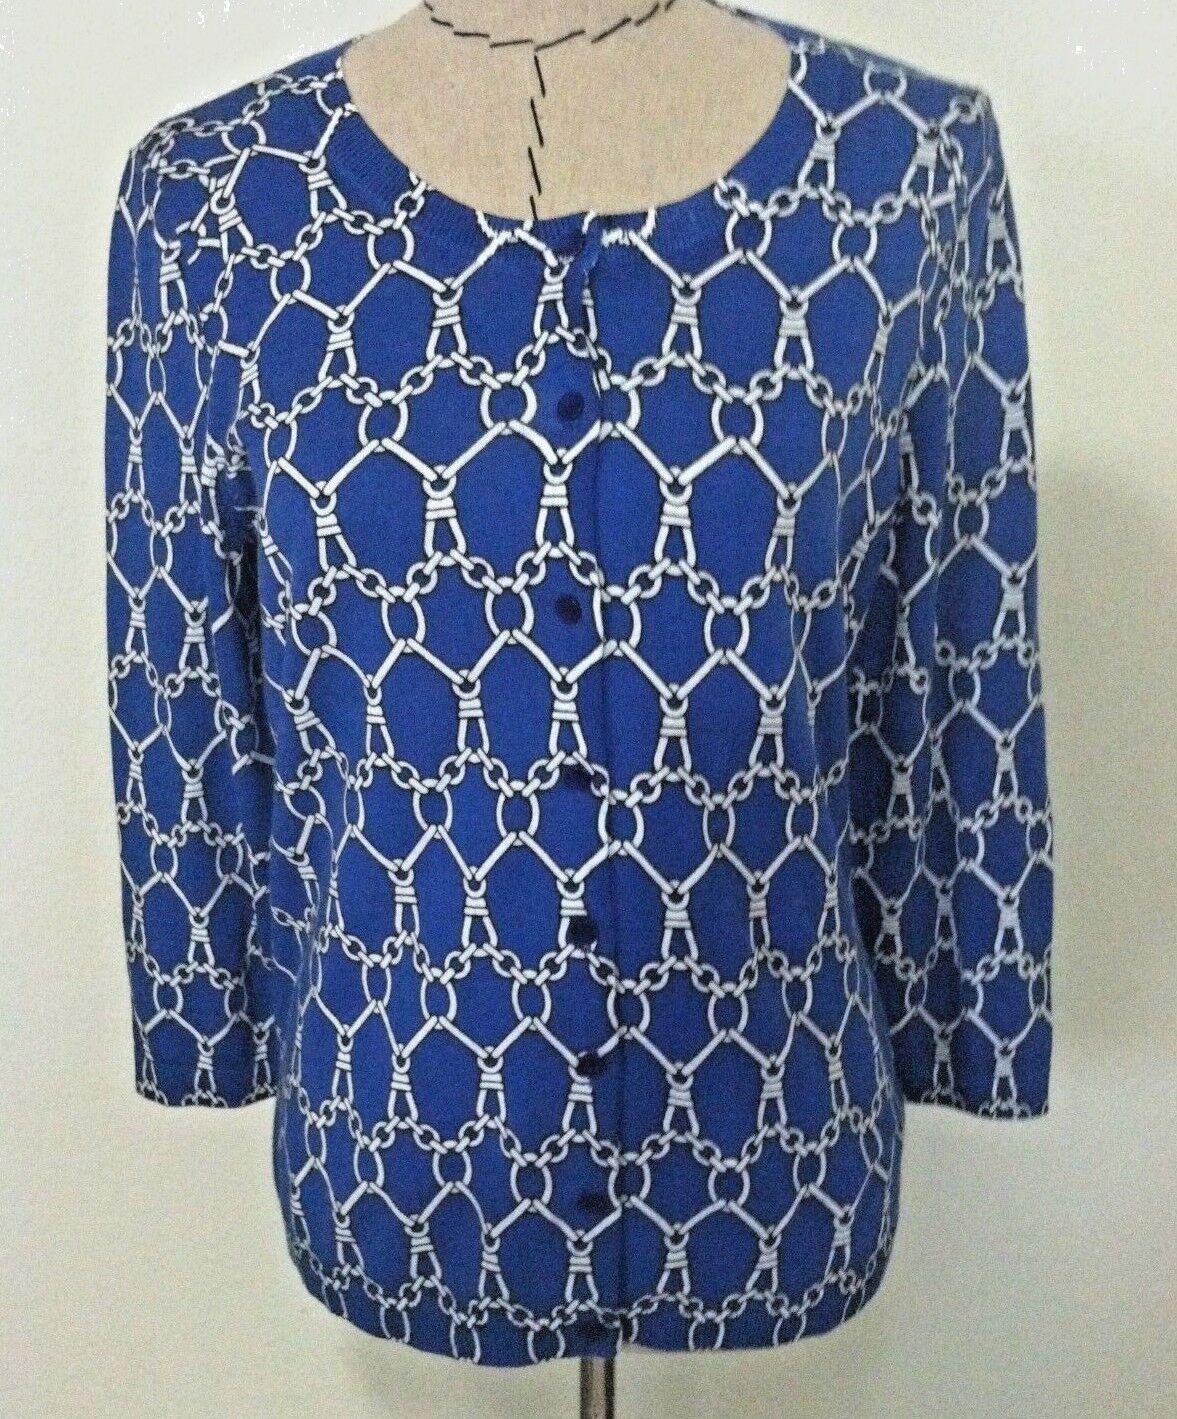 New Talbots L women cardigan button up bluee thin light knit chain 3 4 size